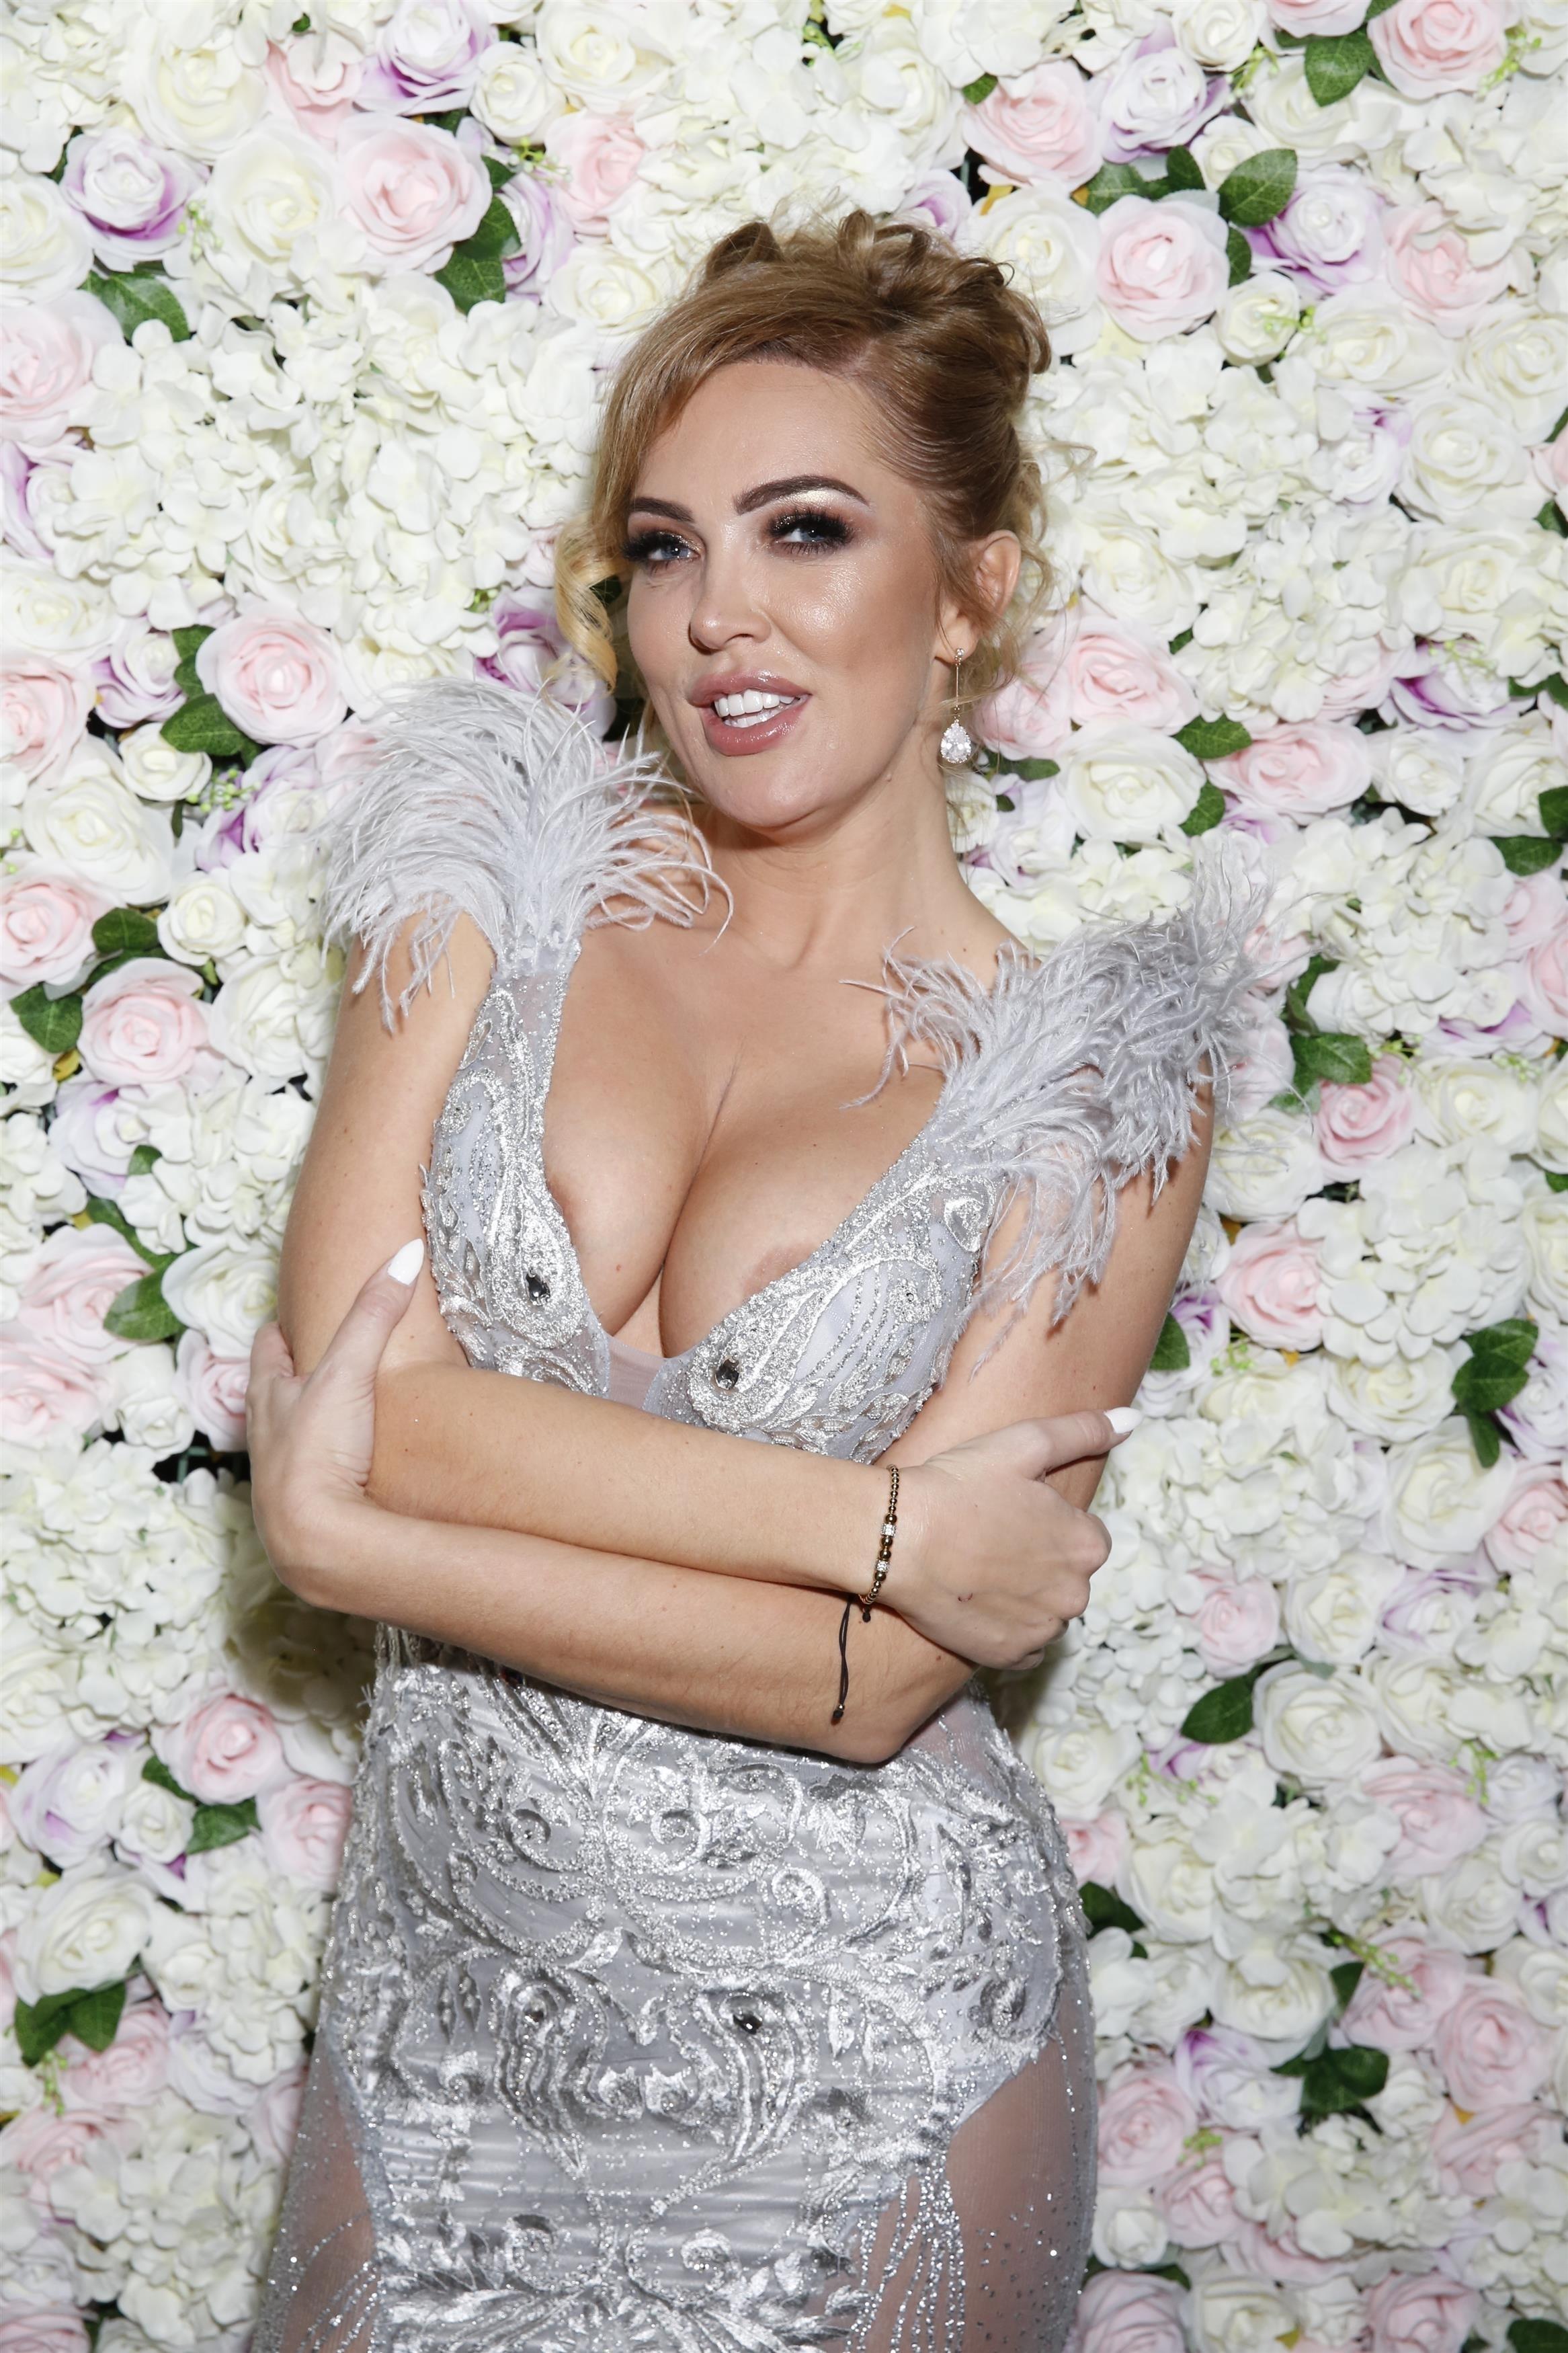 in bikini Leaked Aisleyne Horgan-Wallace naked photo 2017